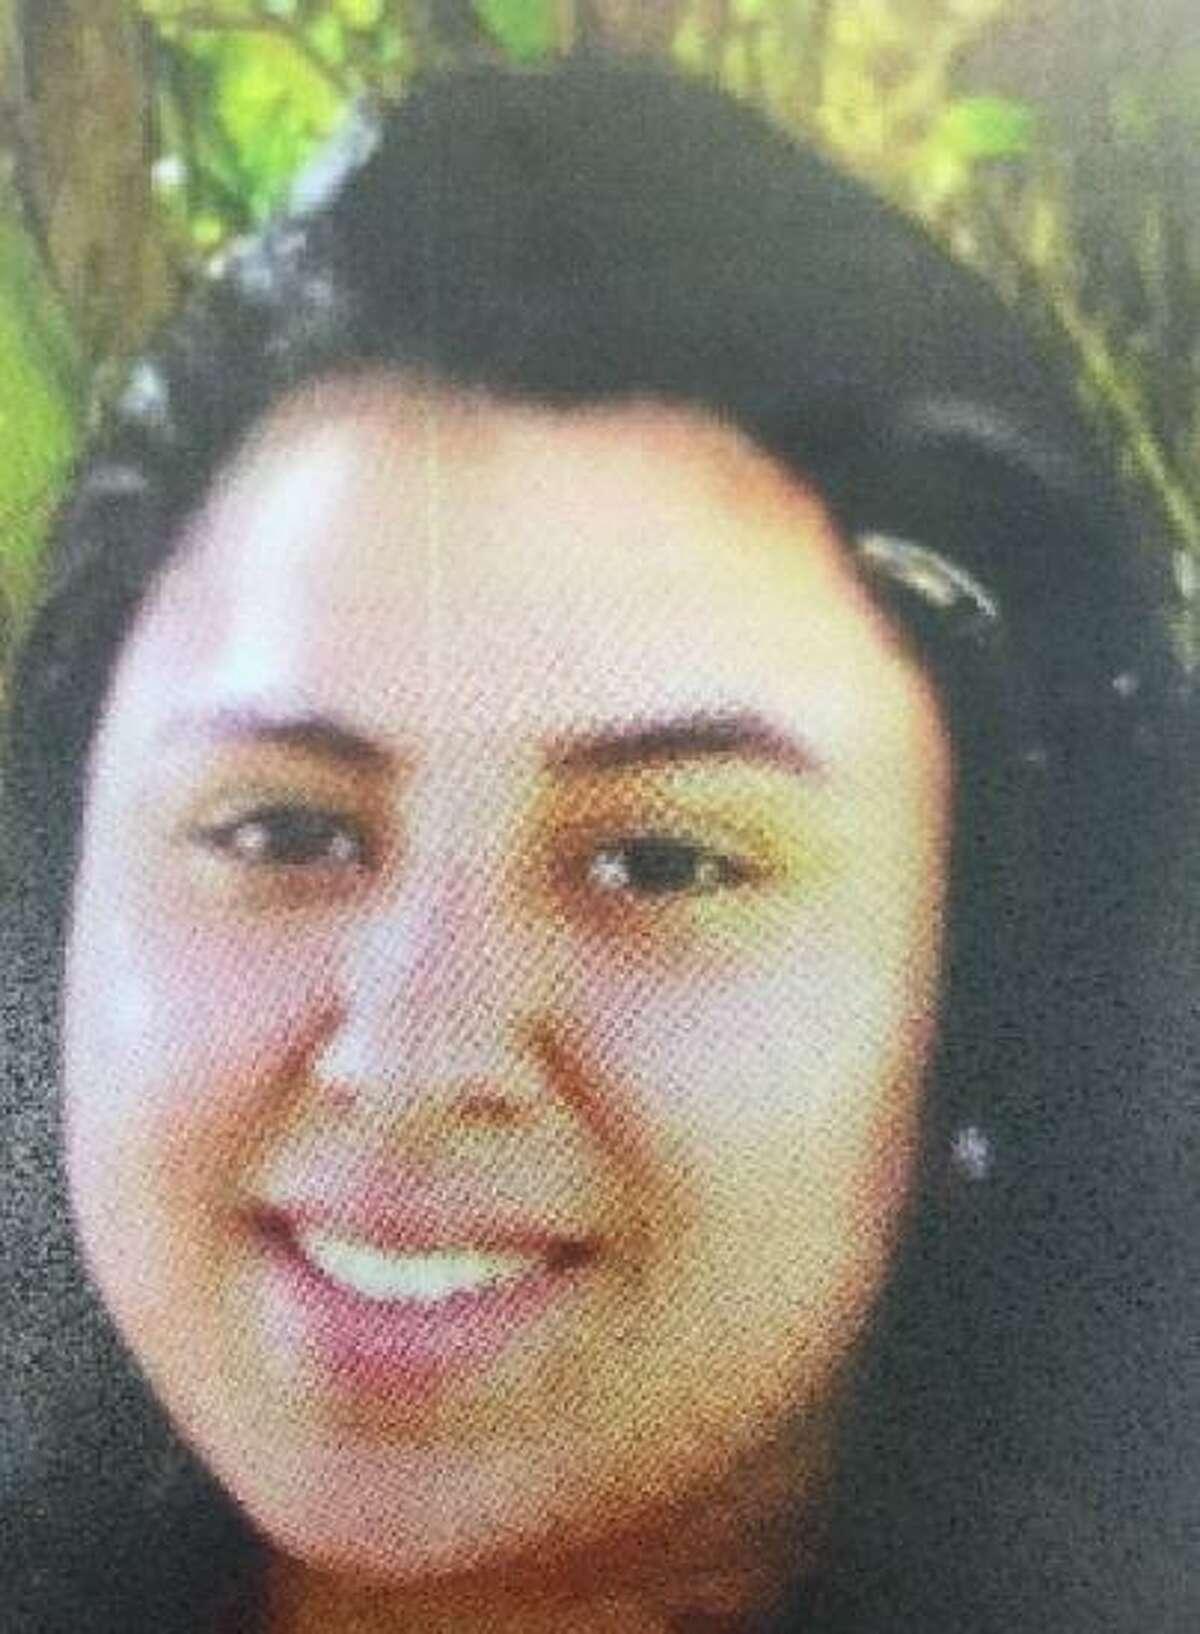 Araceli Baez, 15, has been missing from Hartford since Thursday.